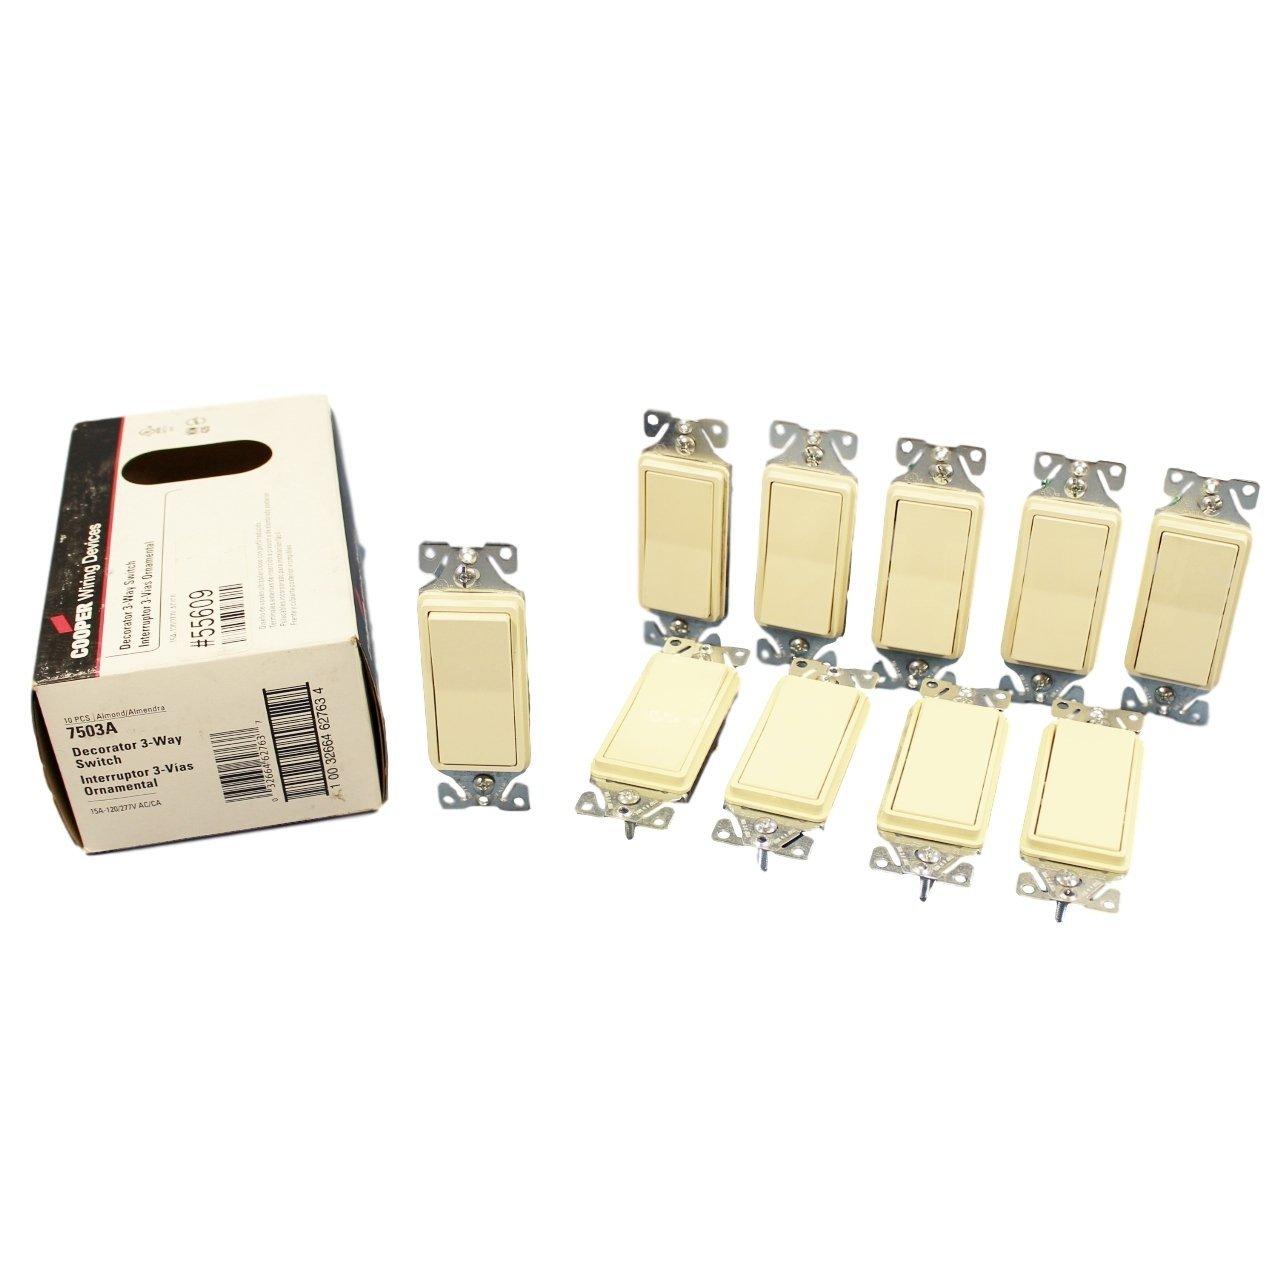 cooper wiring 7503a decorator rocker switch 3 way 15a 120 277vac